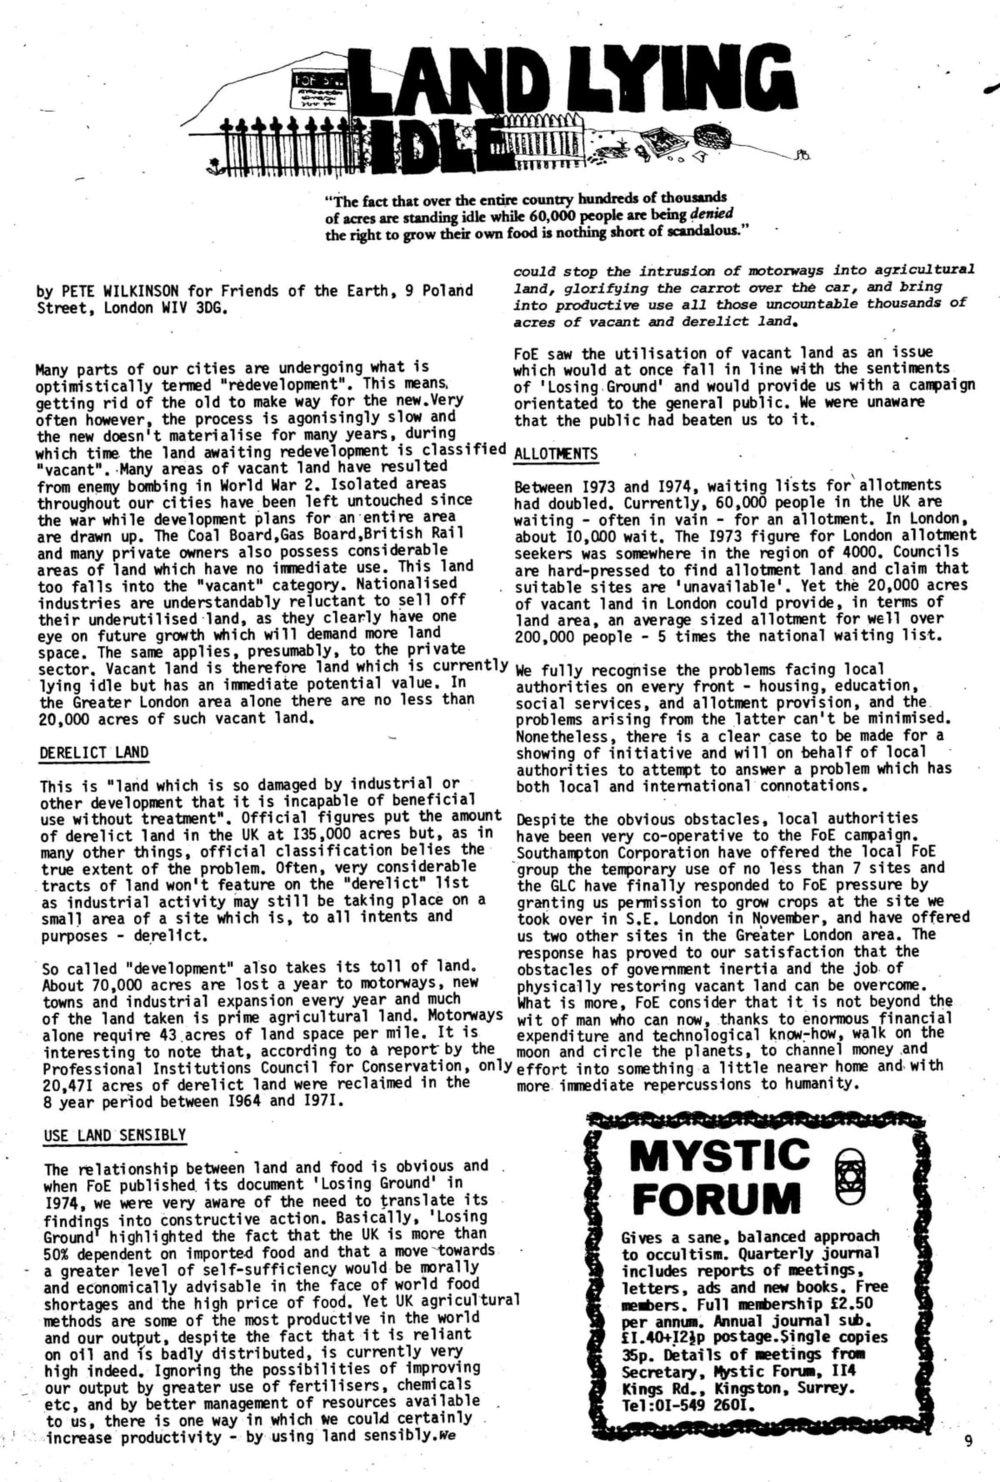 seed-v4-n5-may1975-09.jpg